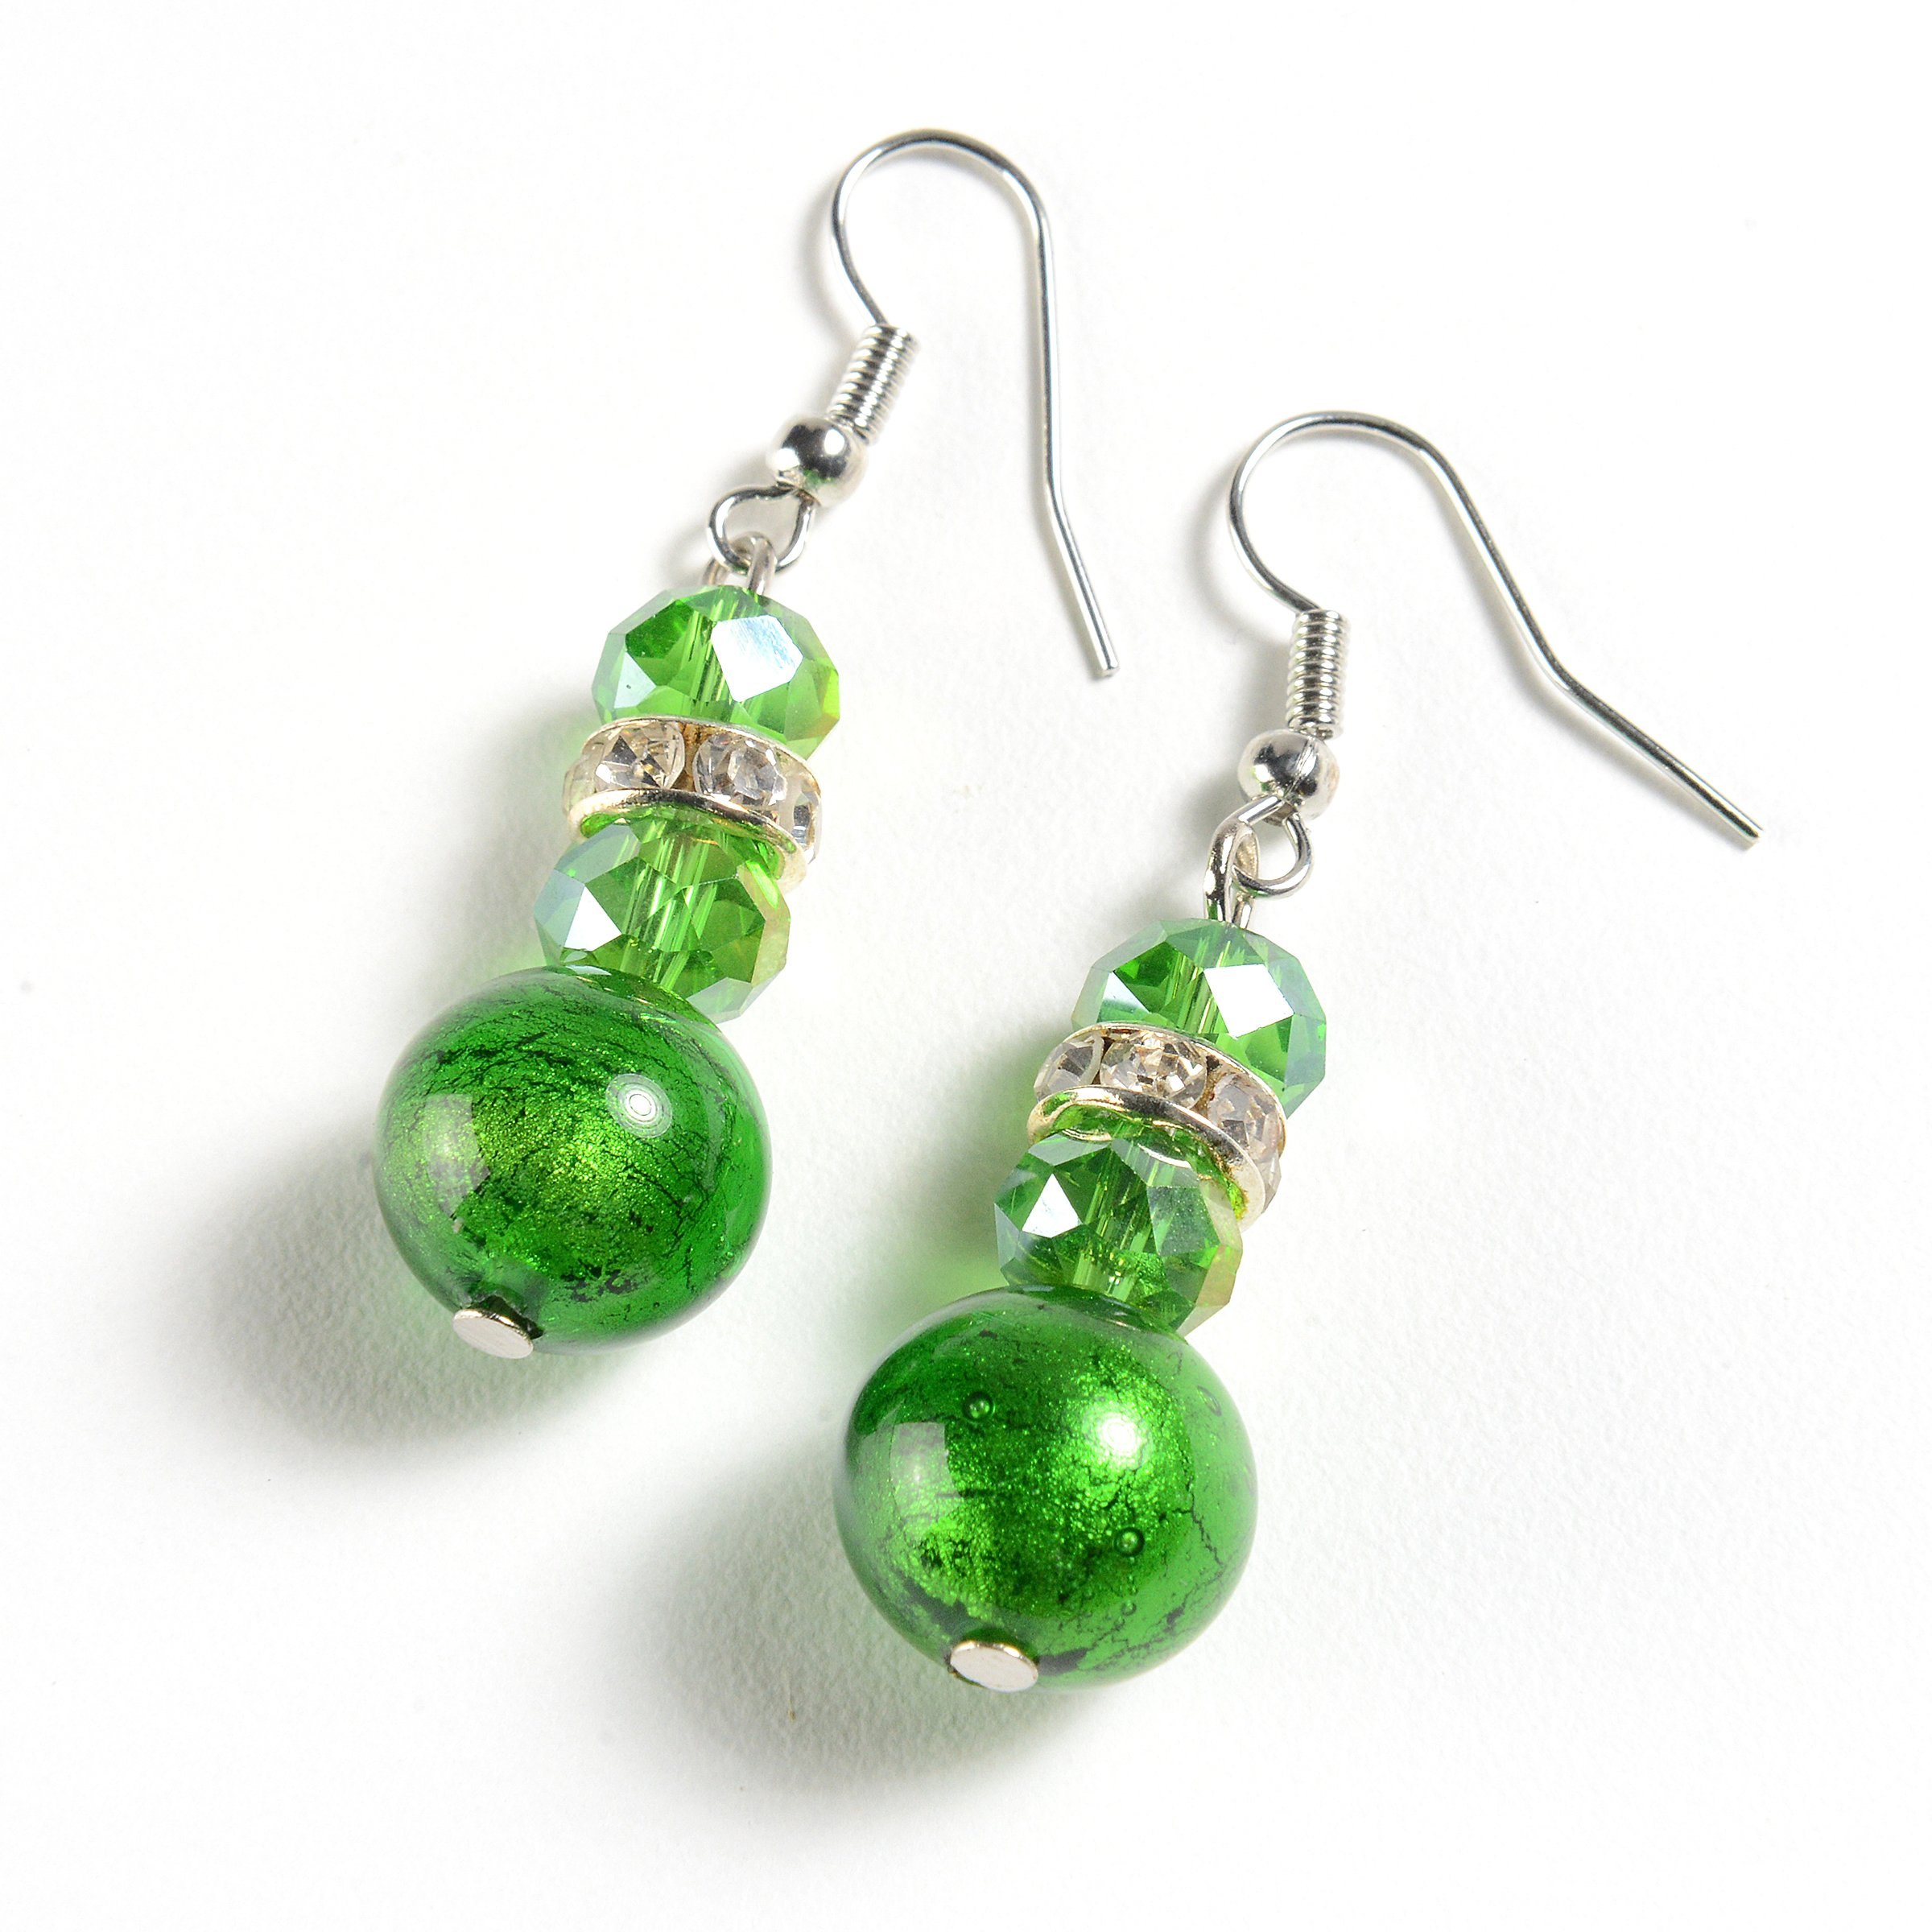 EMBRACE LA GRANDE VITA Murano Glass Earrings from Italy–Earring Set, Jewelry Made w/Murano Glass Beads